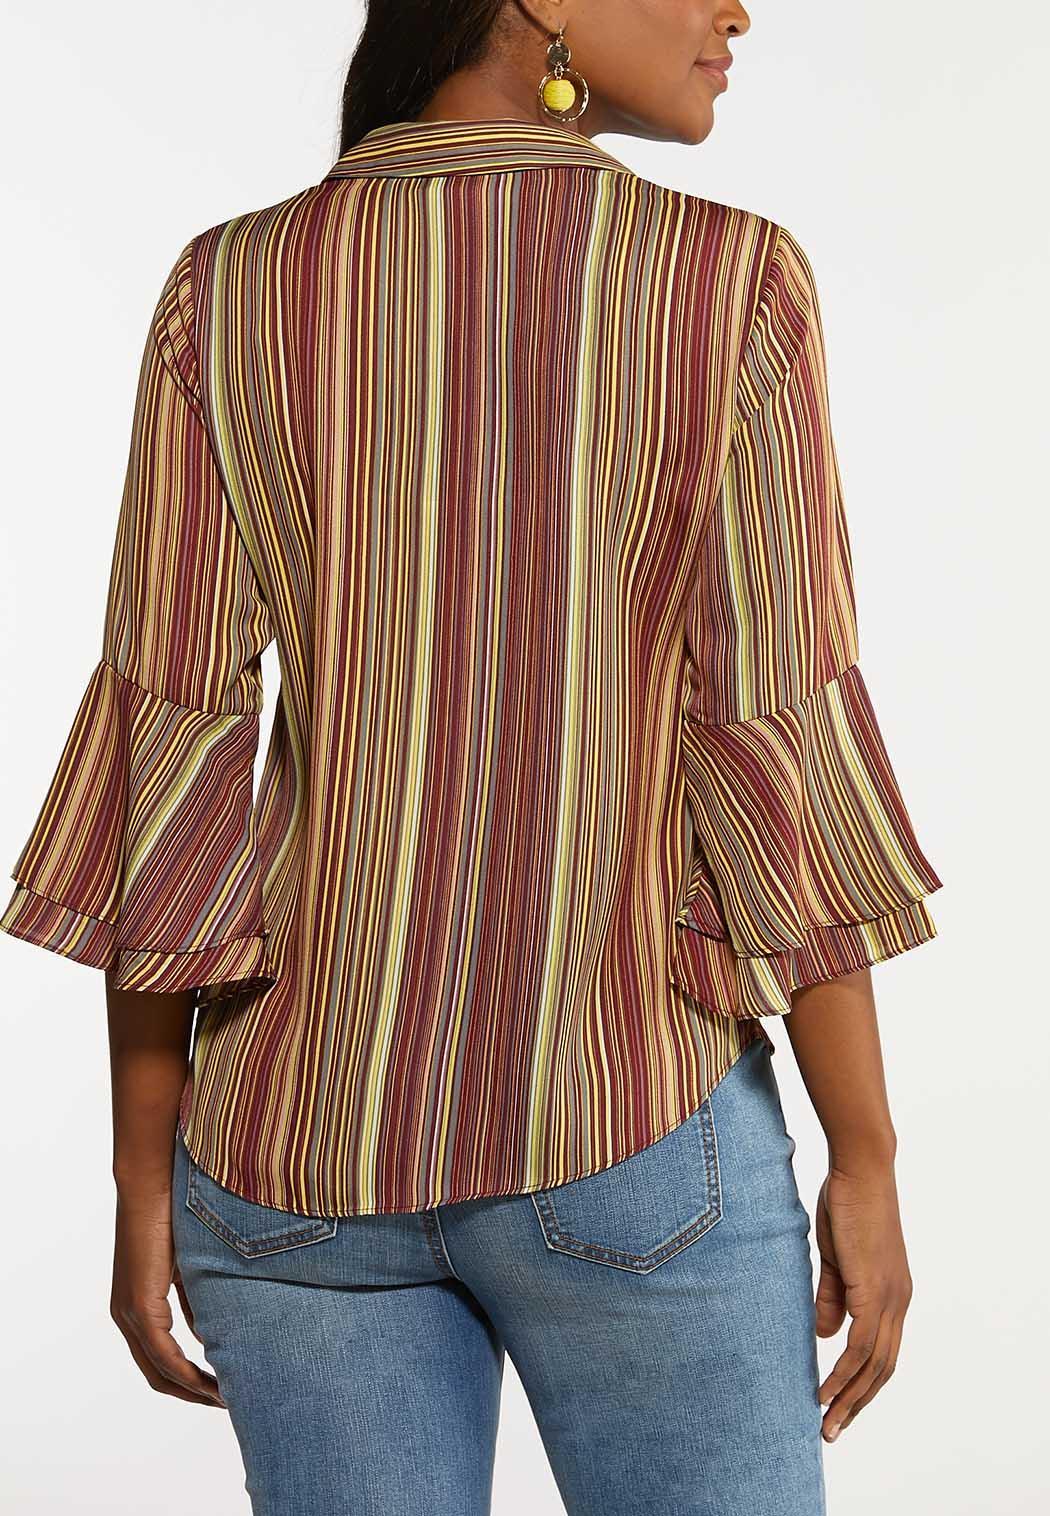 Cranberry Stripe Top (Item #44128229)